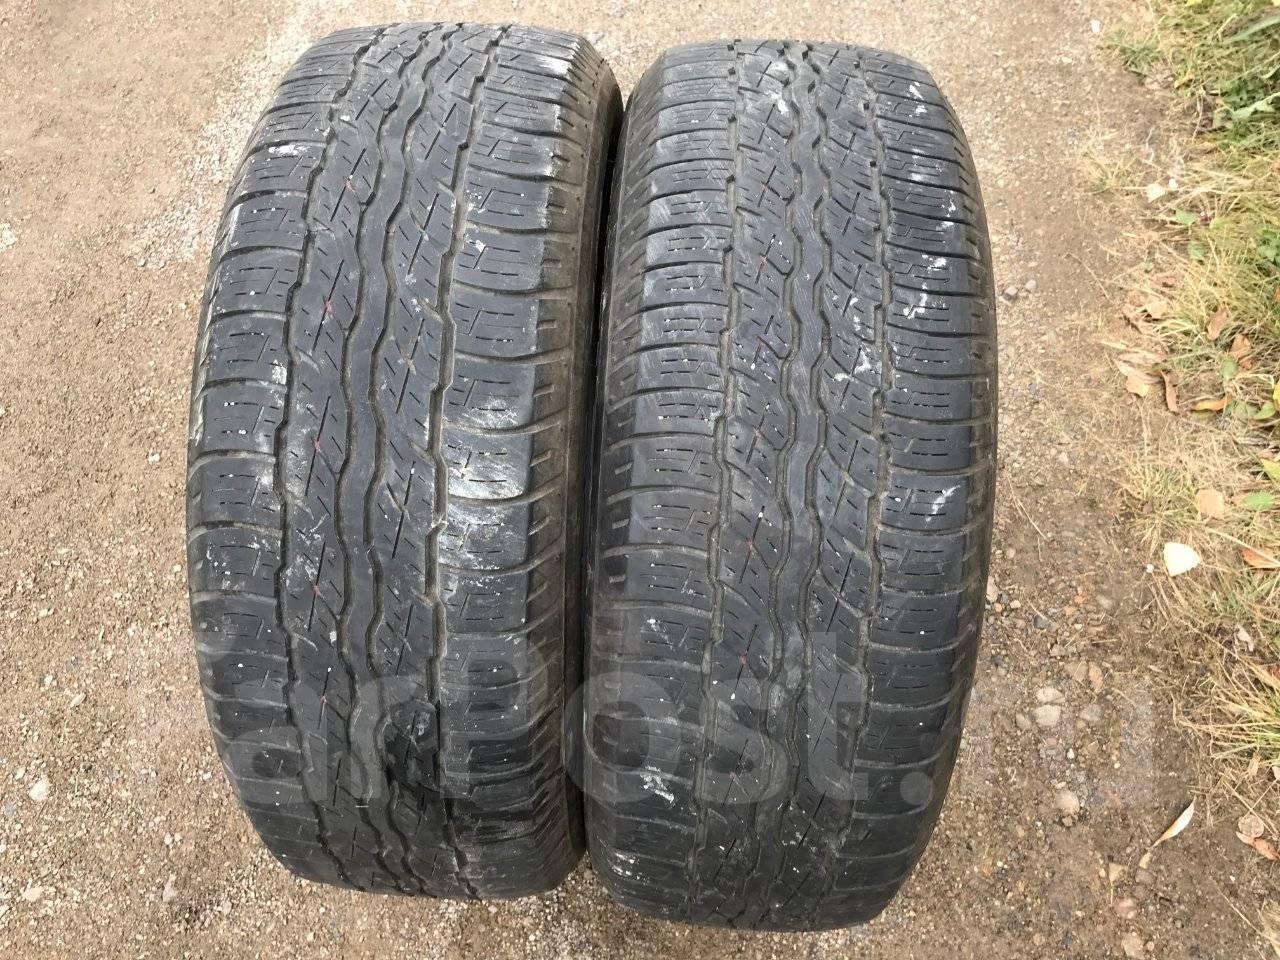 Bridgestone Dueler D 687t 235 Daftar Harga Terkini Terlengkap Voucher Ban Mobil New Techno Tecaz 185 65 R15 H T 687